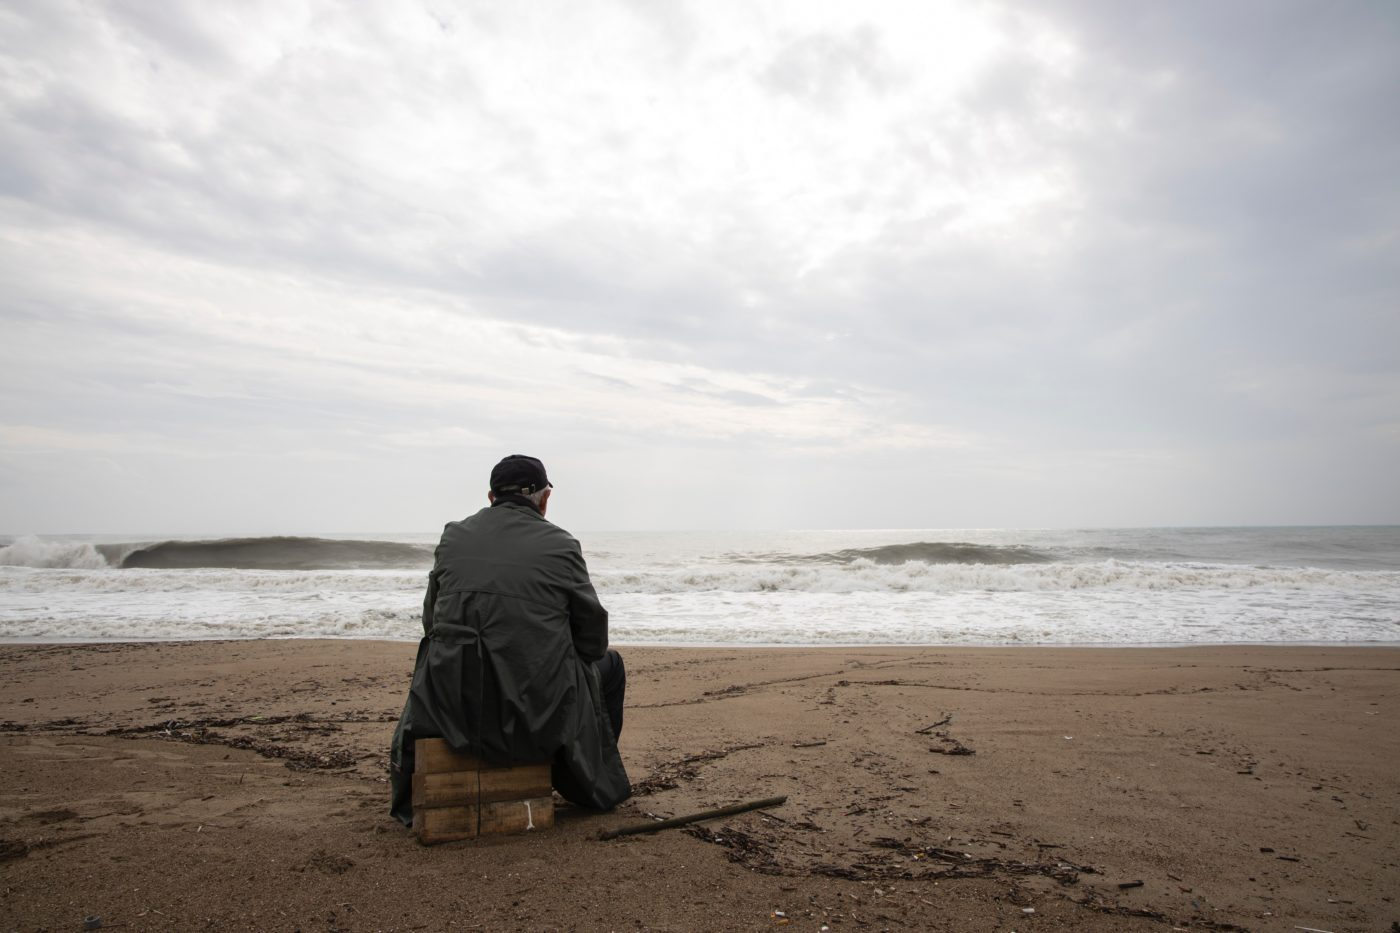 Elder on the beach alone